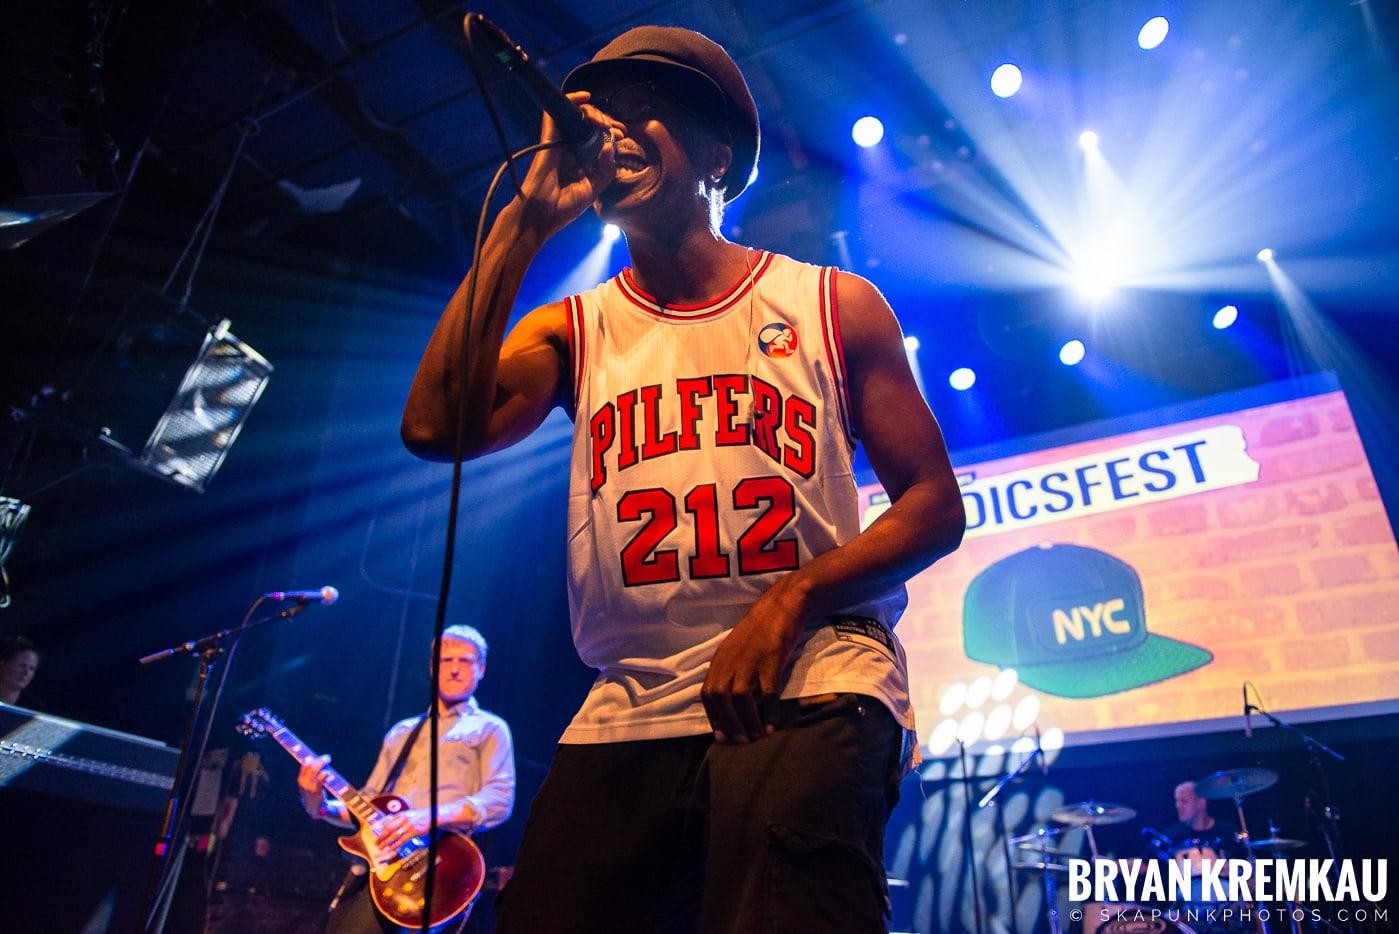 Pilfers @ Radicsfest, Gramercy Theatre, NYC - 7.19.19 (56)